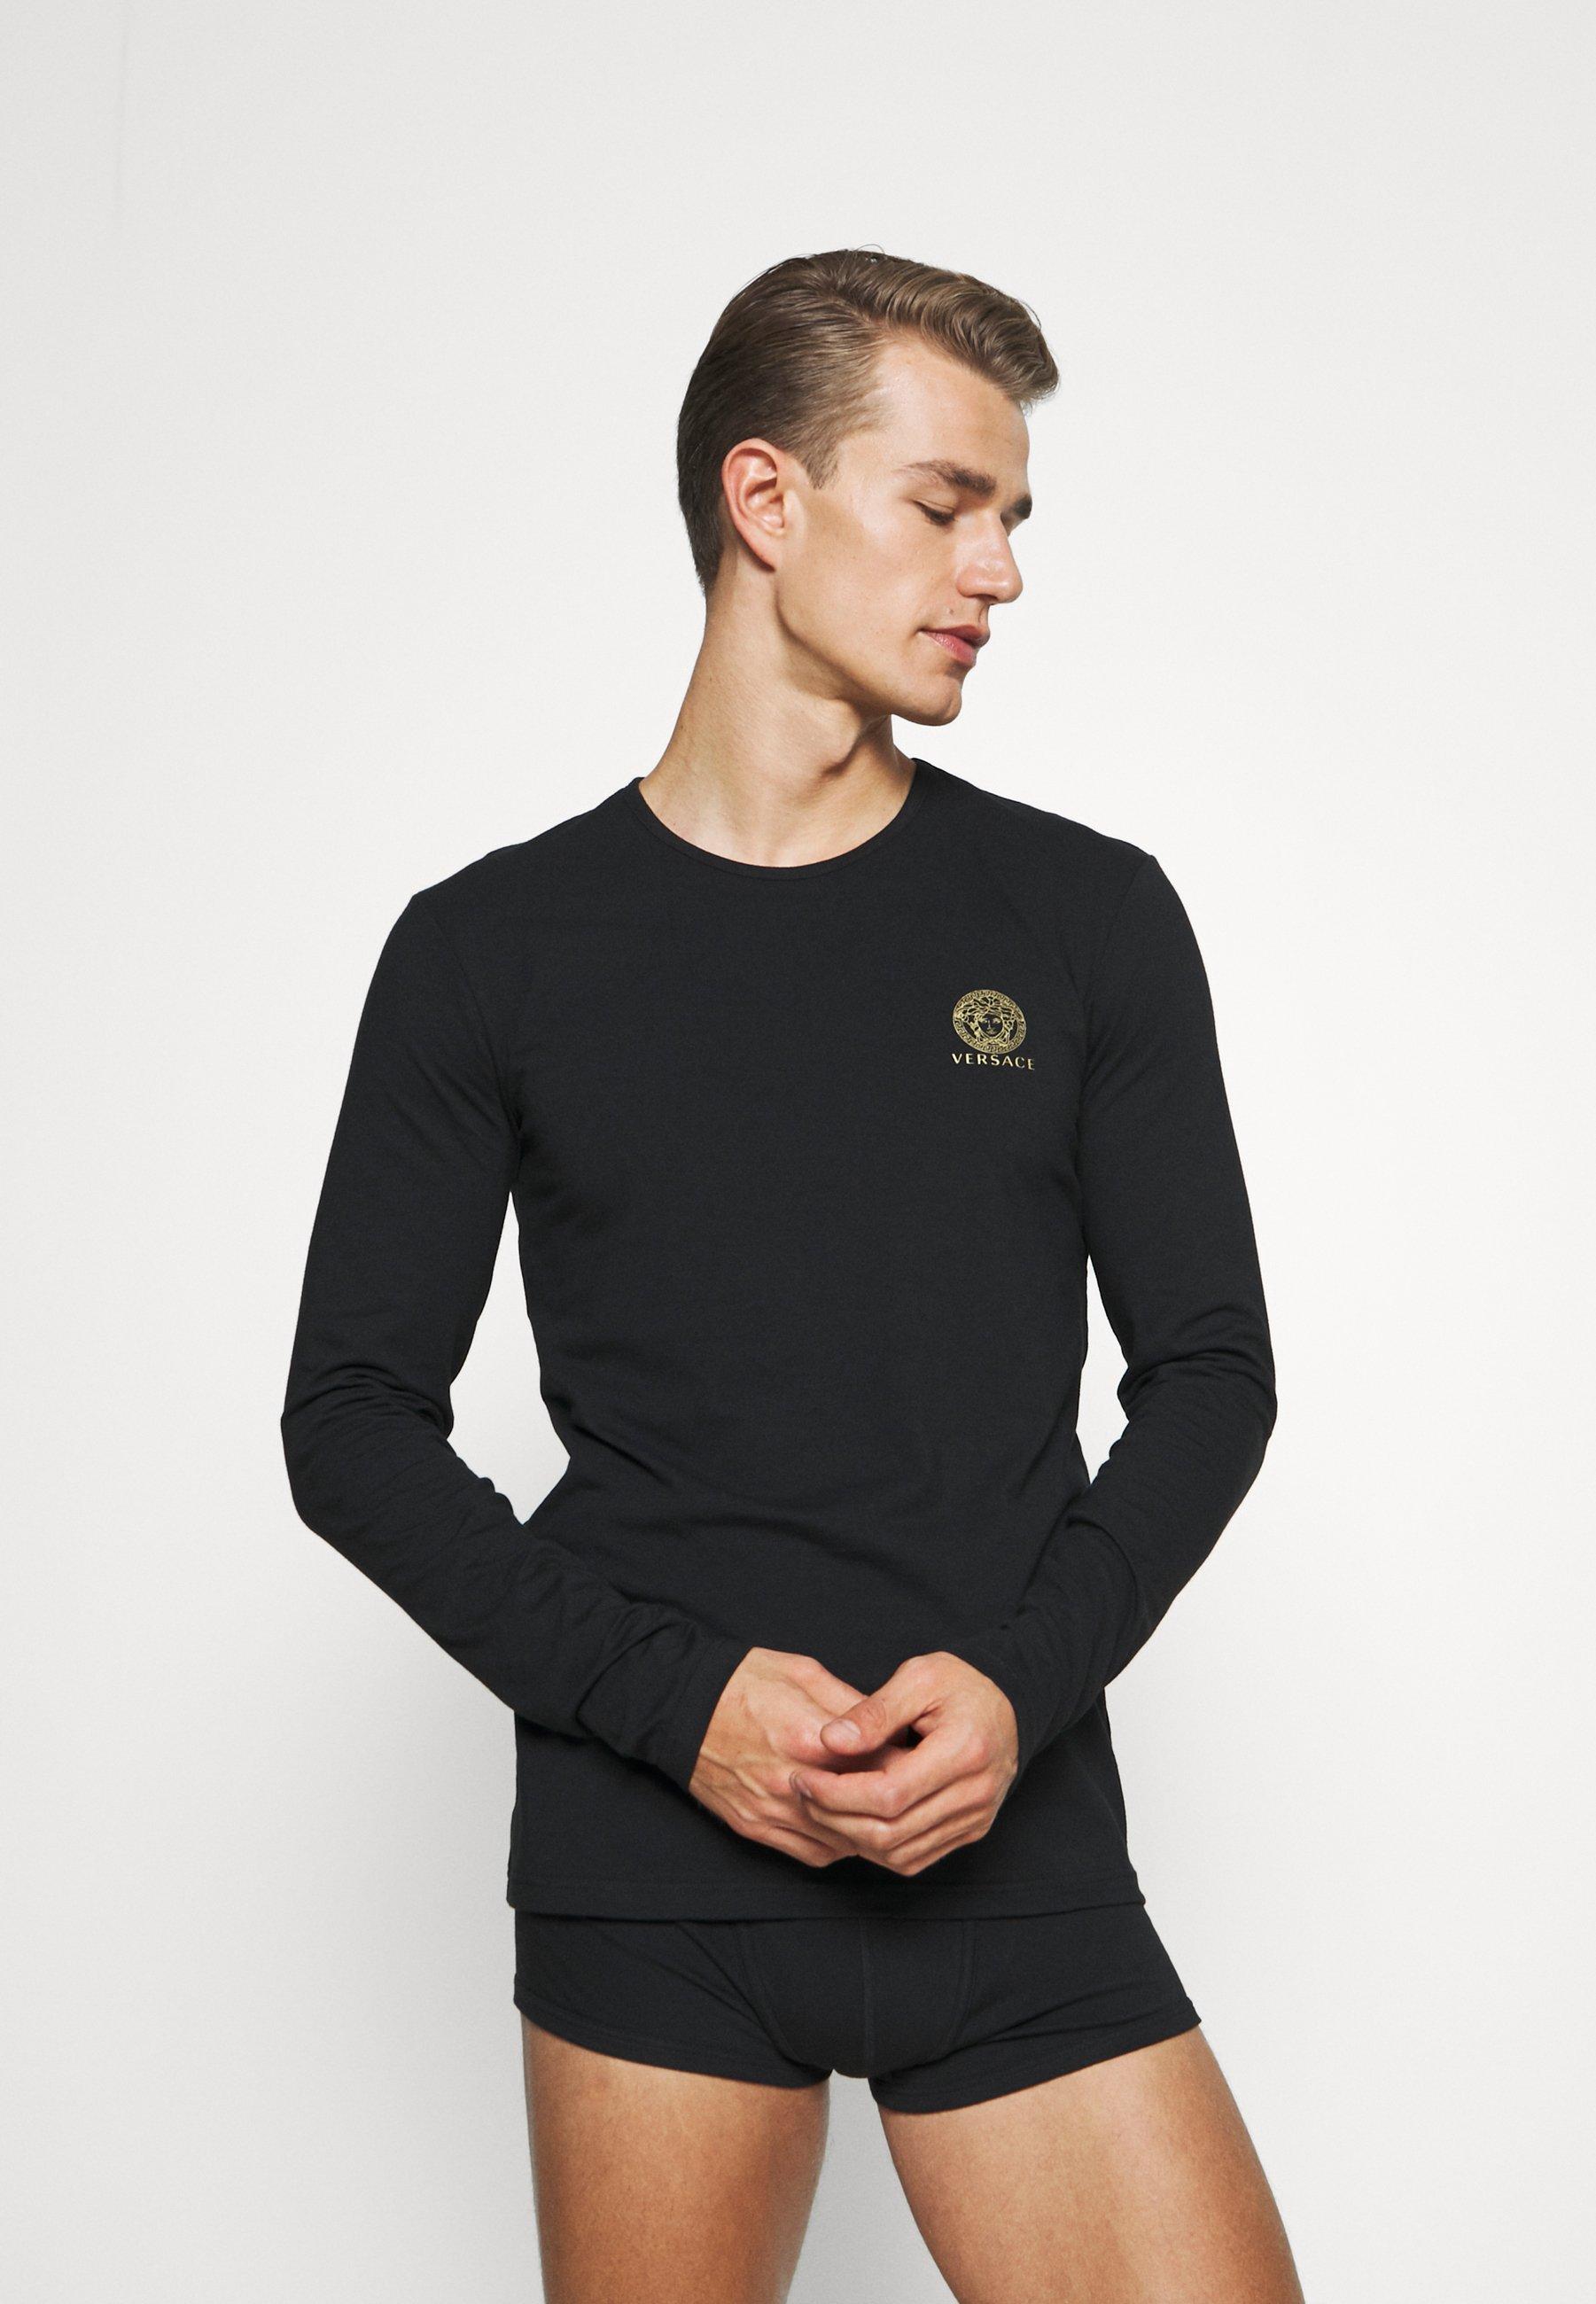 Herren GIROCOLLO INTIMO UOMO - Nachtwäsche Shirt